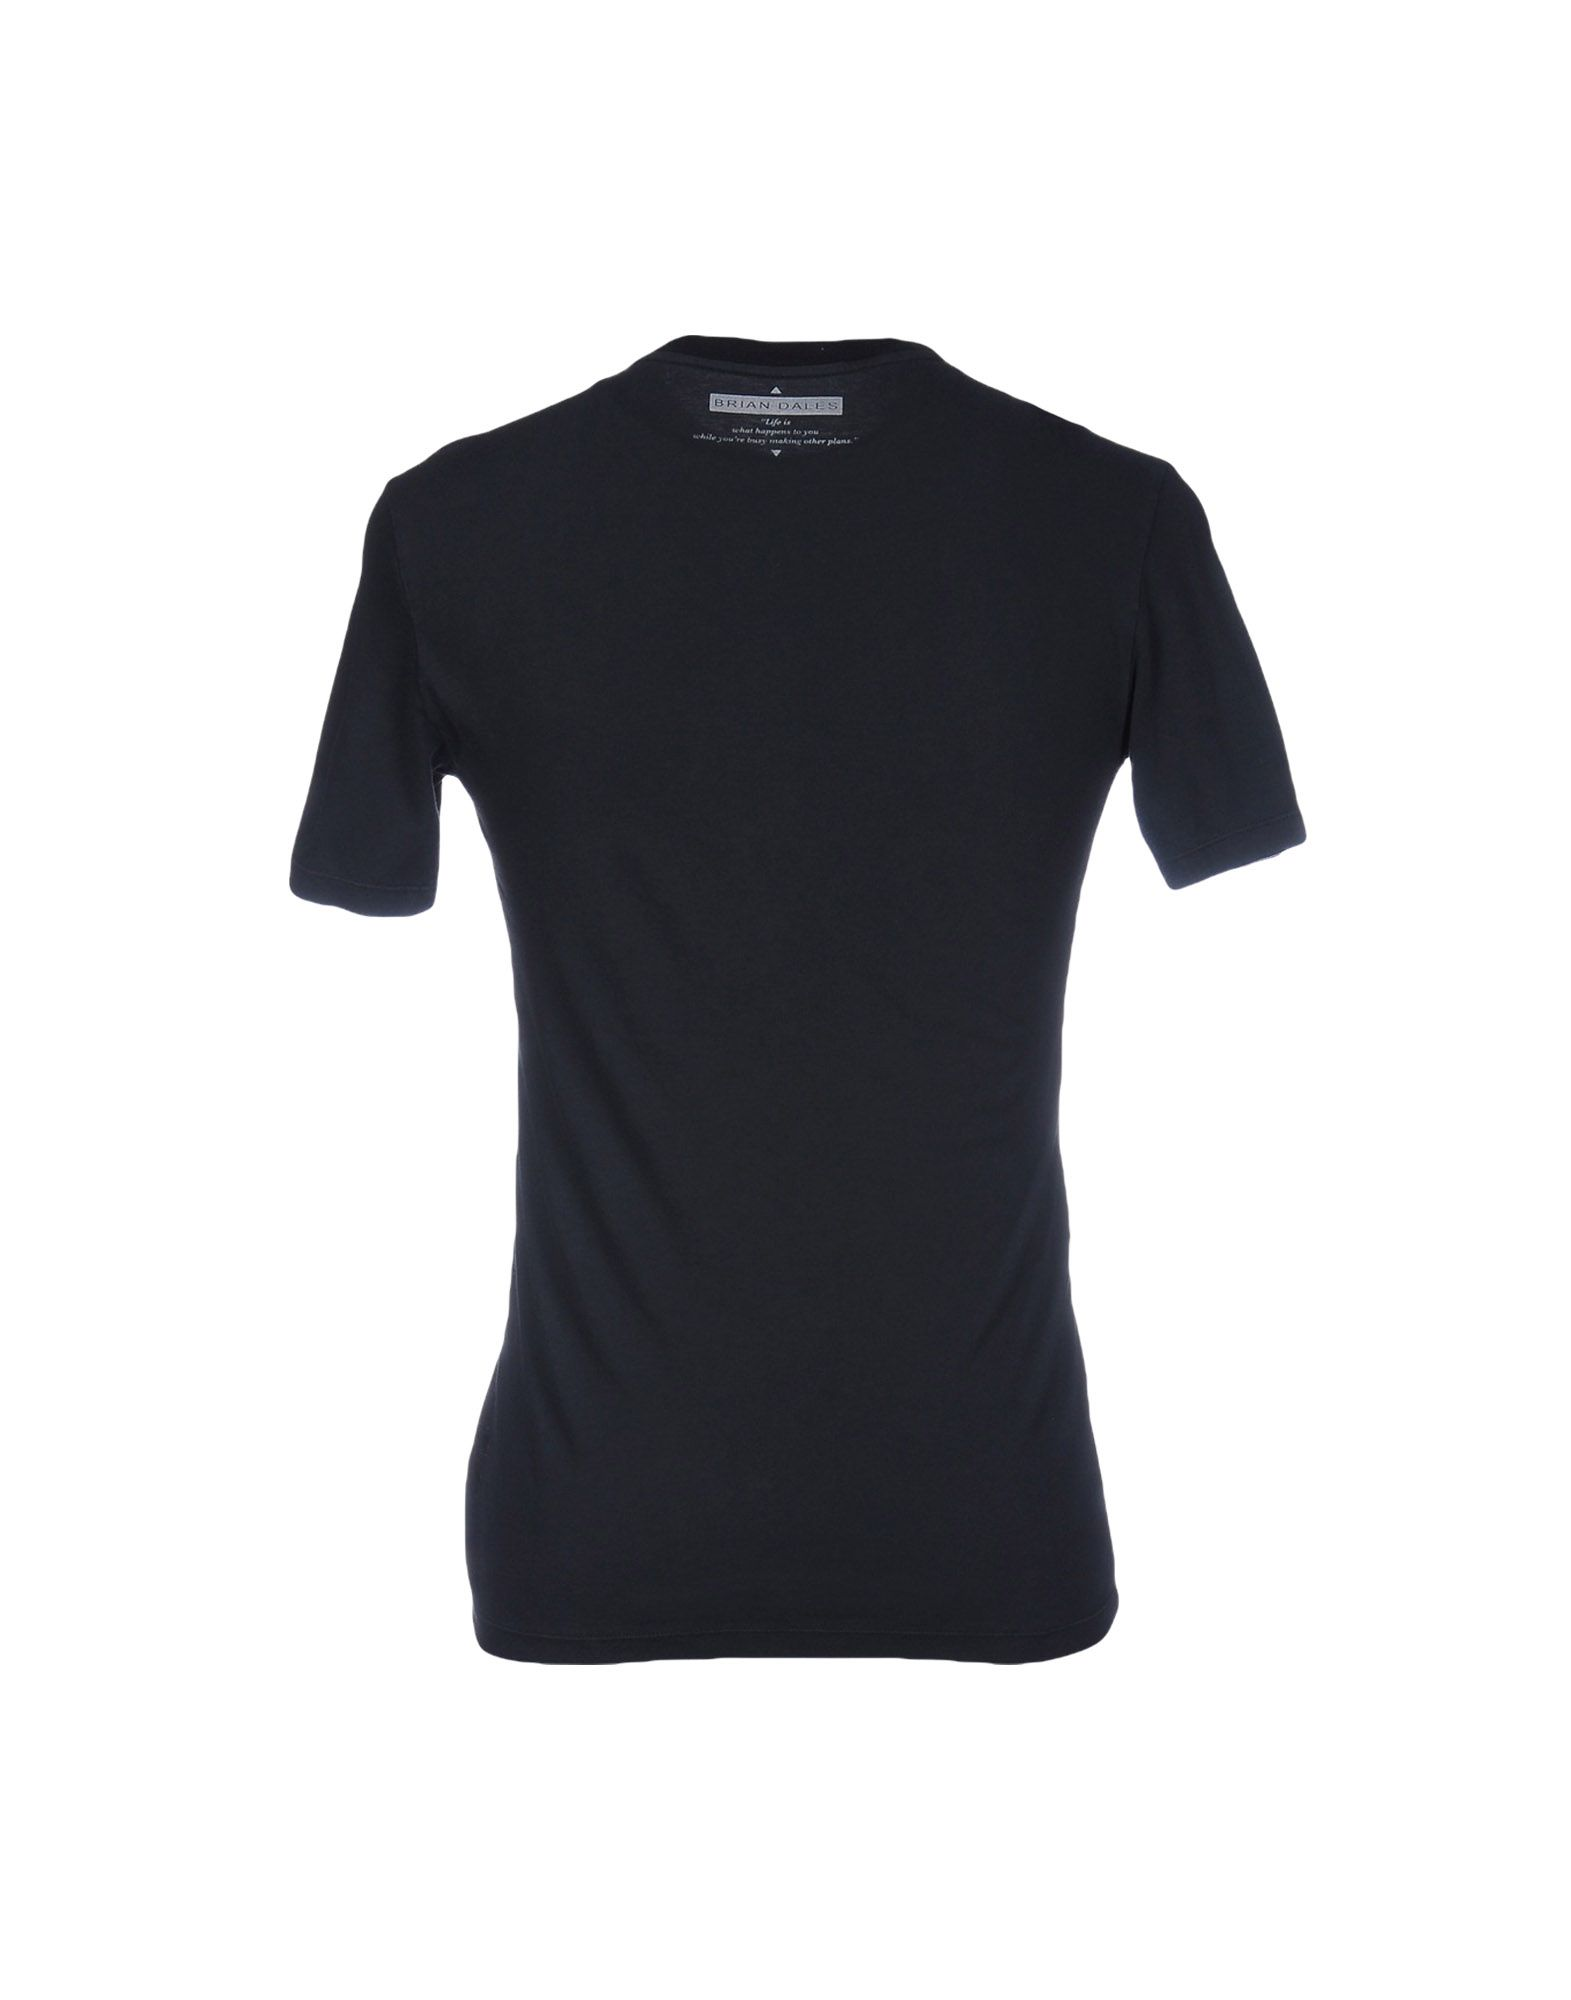 T-Shirt Brian Dales 37945915UQ Uomo - 37945915UQ Dales accce4